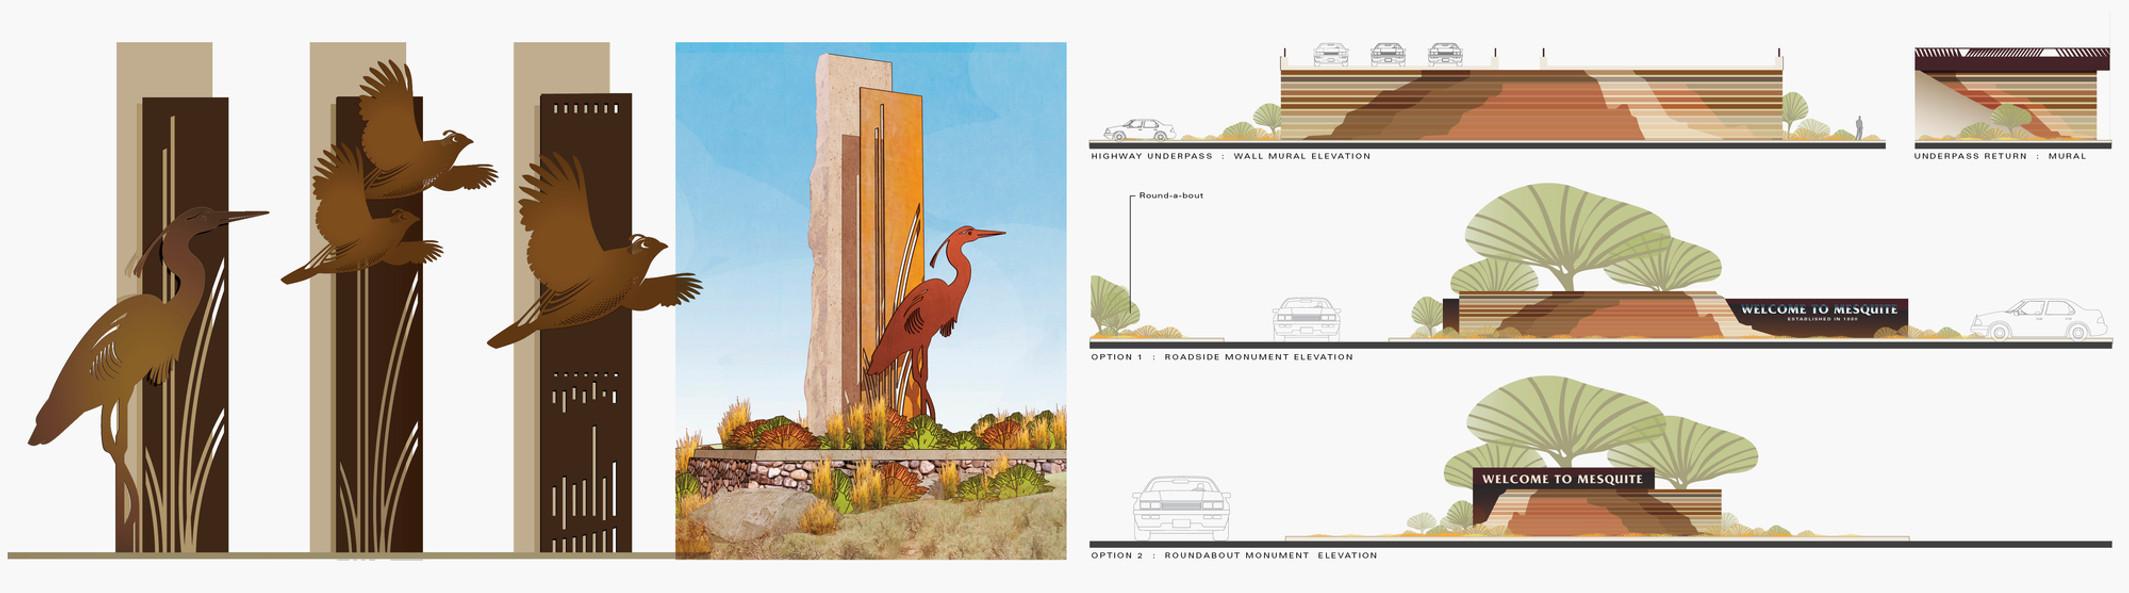 Environmentl design campaigns for public realms.